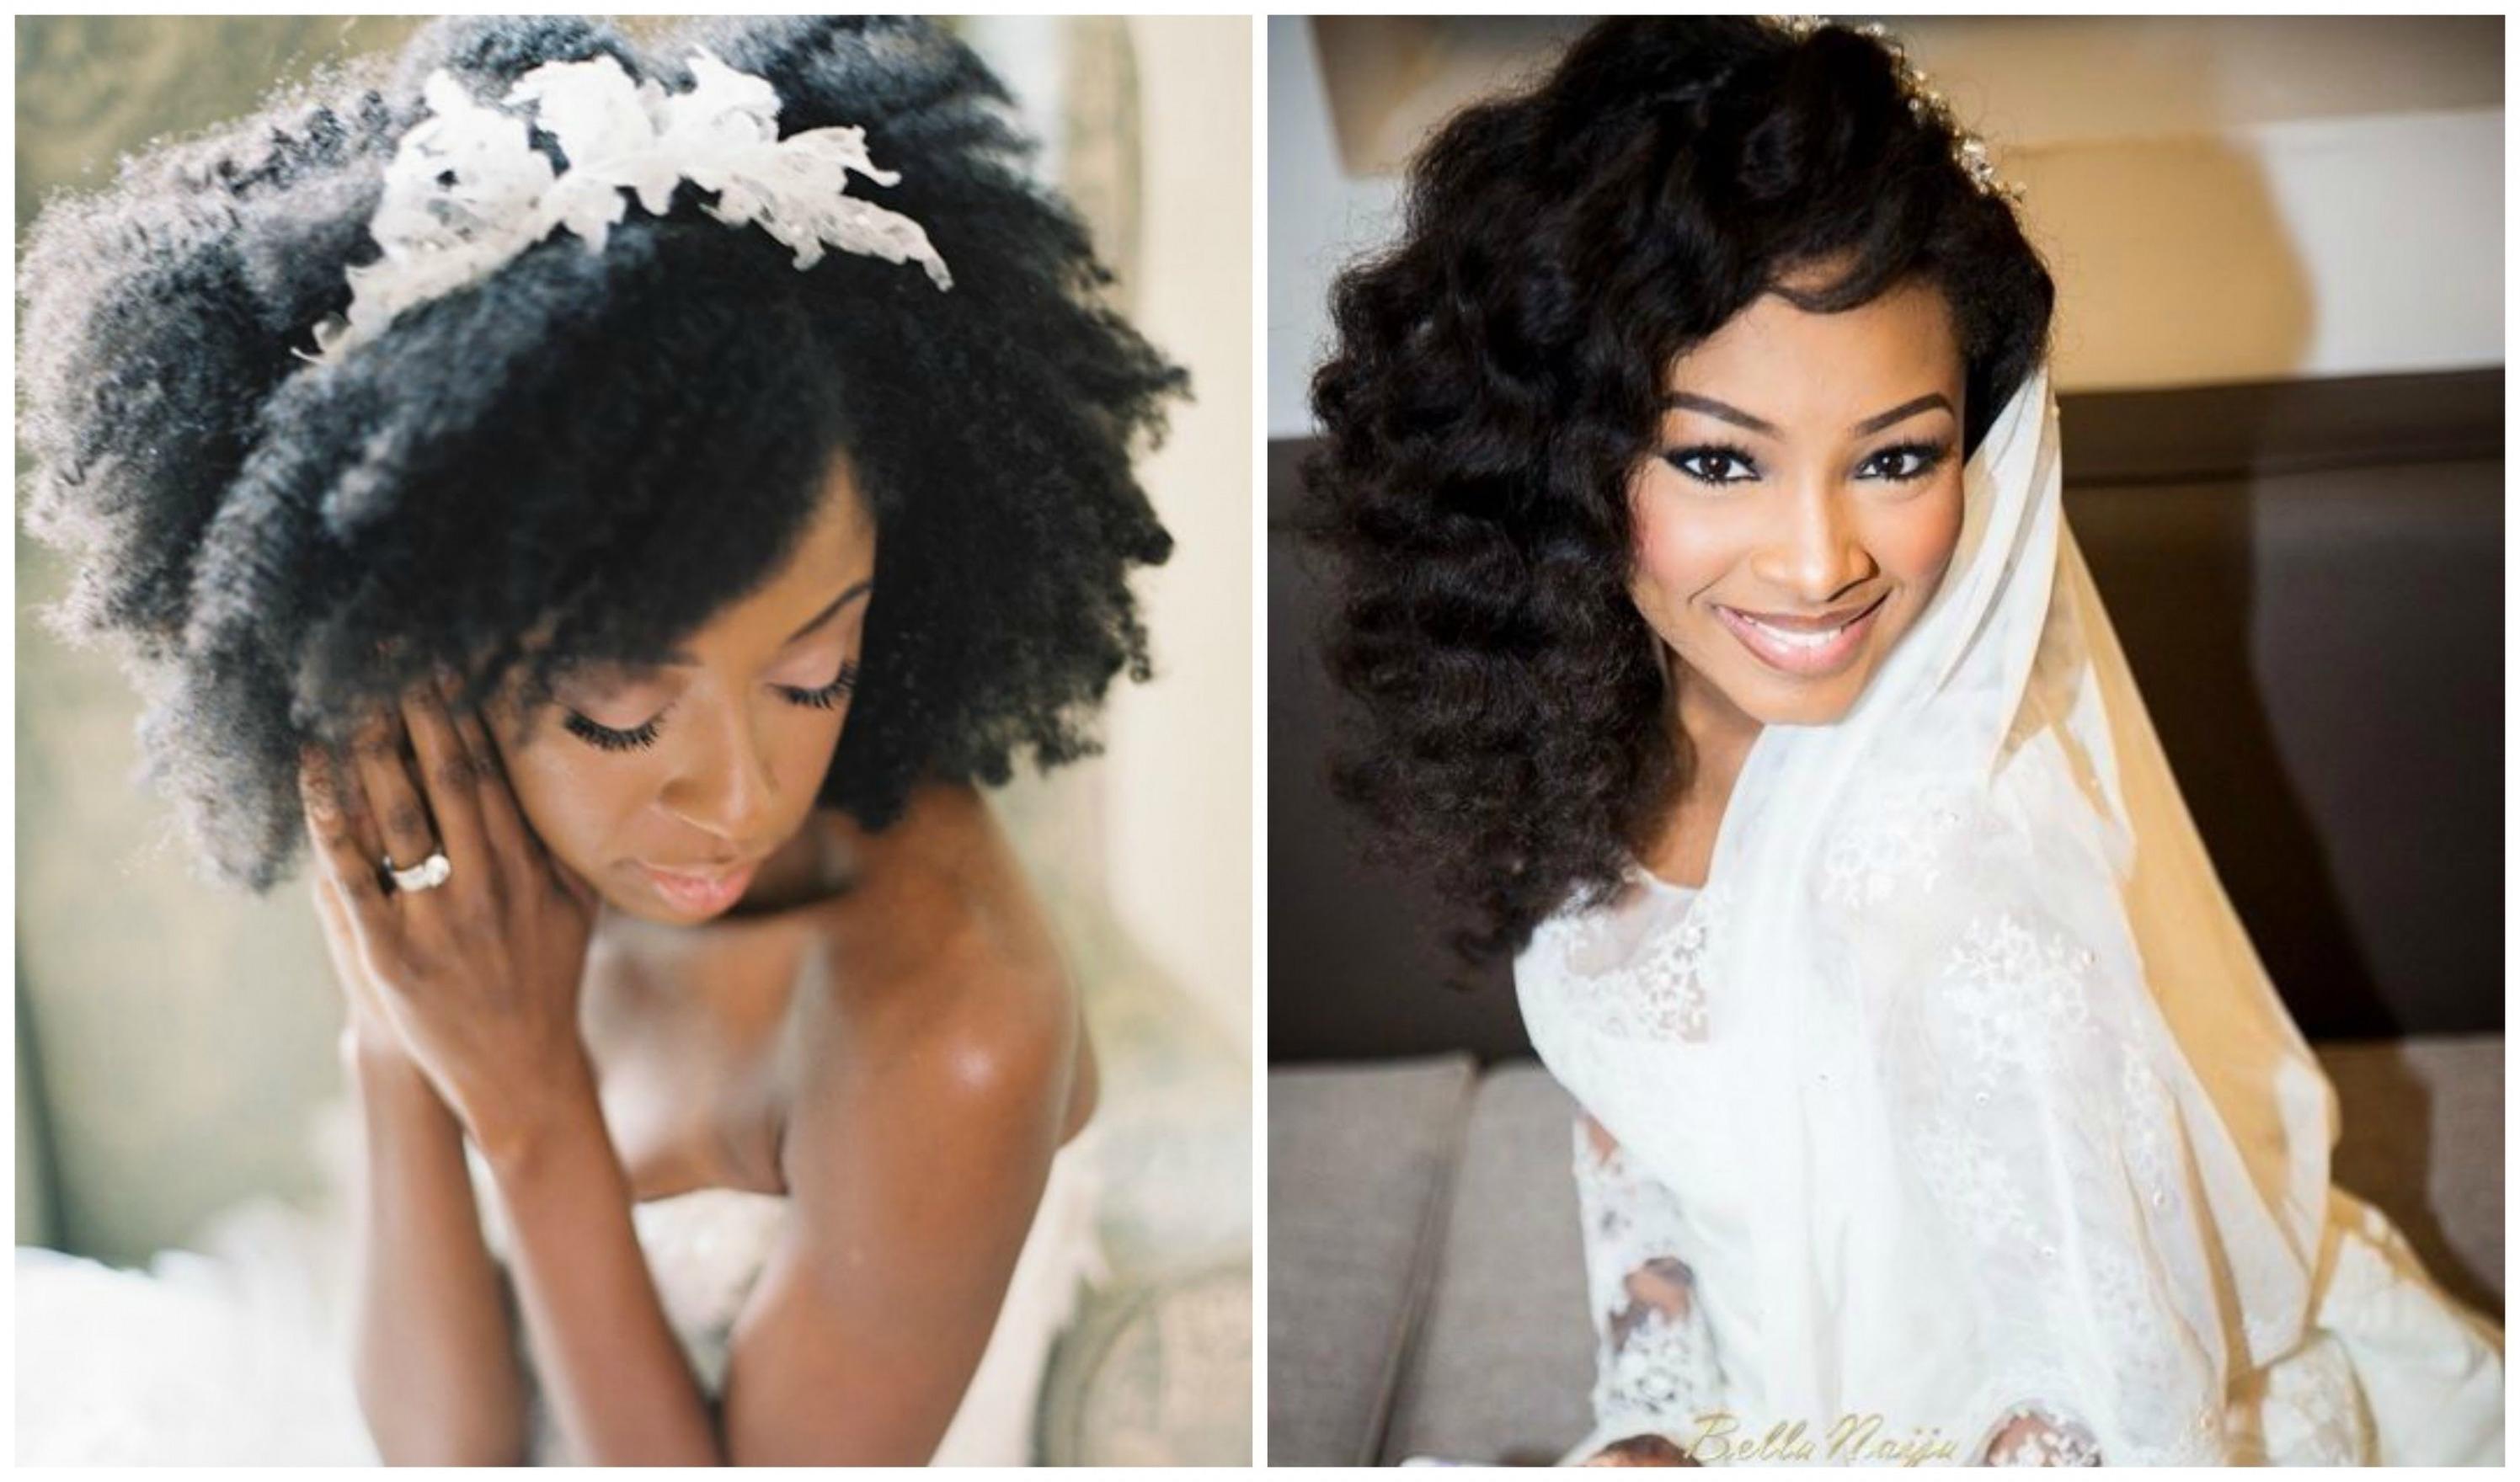 [%Preferred Black Wedding Hairstyles Intended For 100 [ Black Wedding Hairstyles ] Ideas Of Bridal Hairstyles Black|100 [ Black Wedding Hairstyles ] Ideas Of Bridal Hairstyles Black With Most Up To Date Black Wedding Hairstyles%] (View 1 of 15)